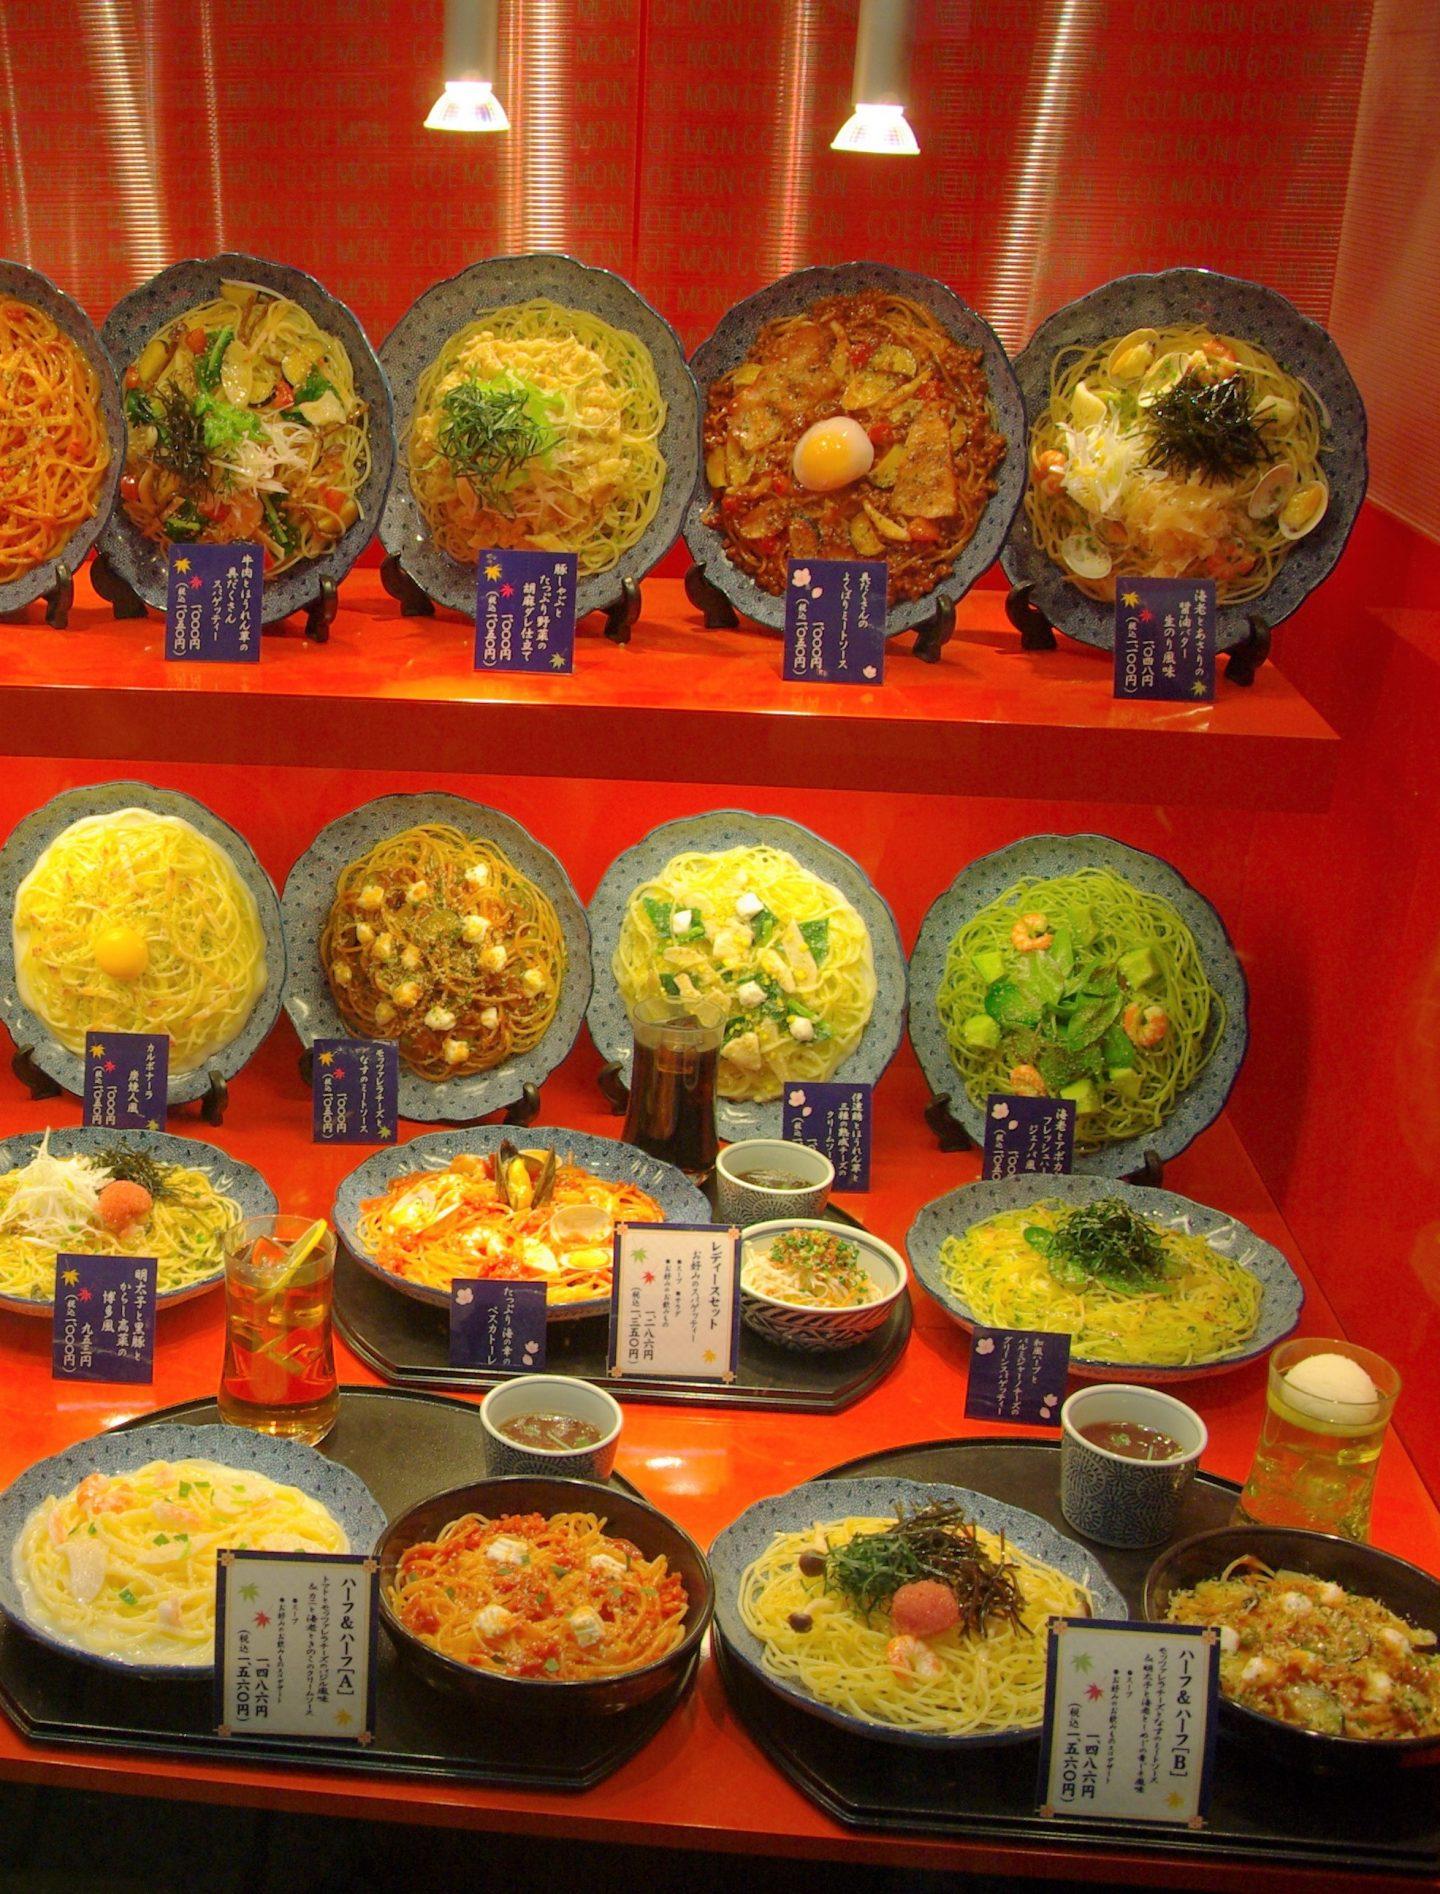 Plastik Essen Japan